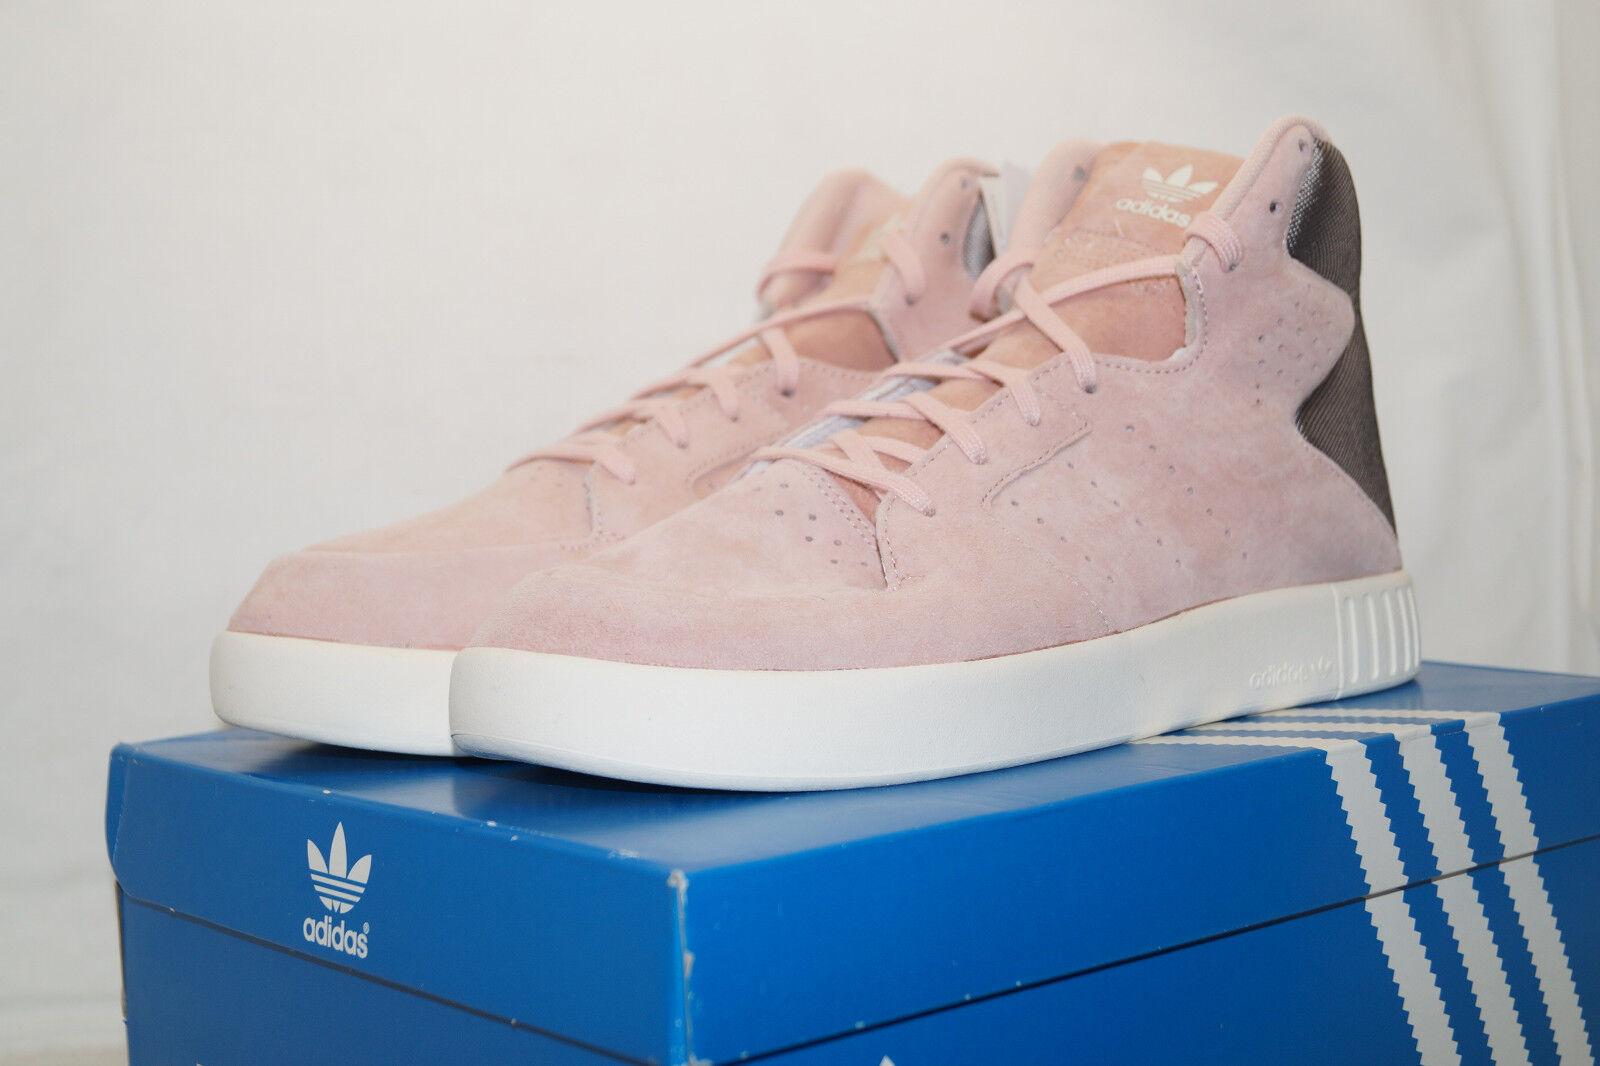 Adidas Sneakers Originals tubular Invader 2.0 W 41.3 rosa s80555 Sneakers Adidas ee2f95